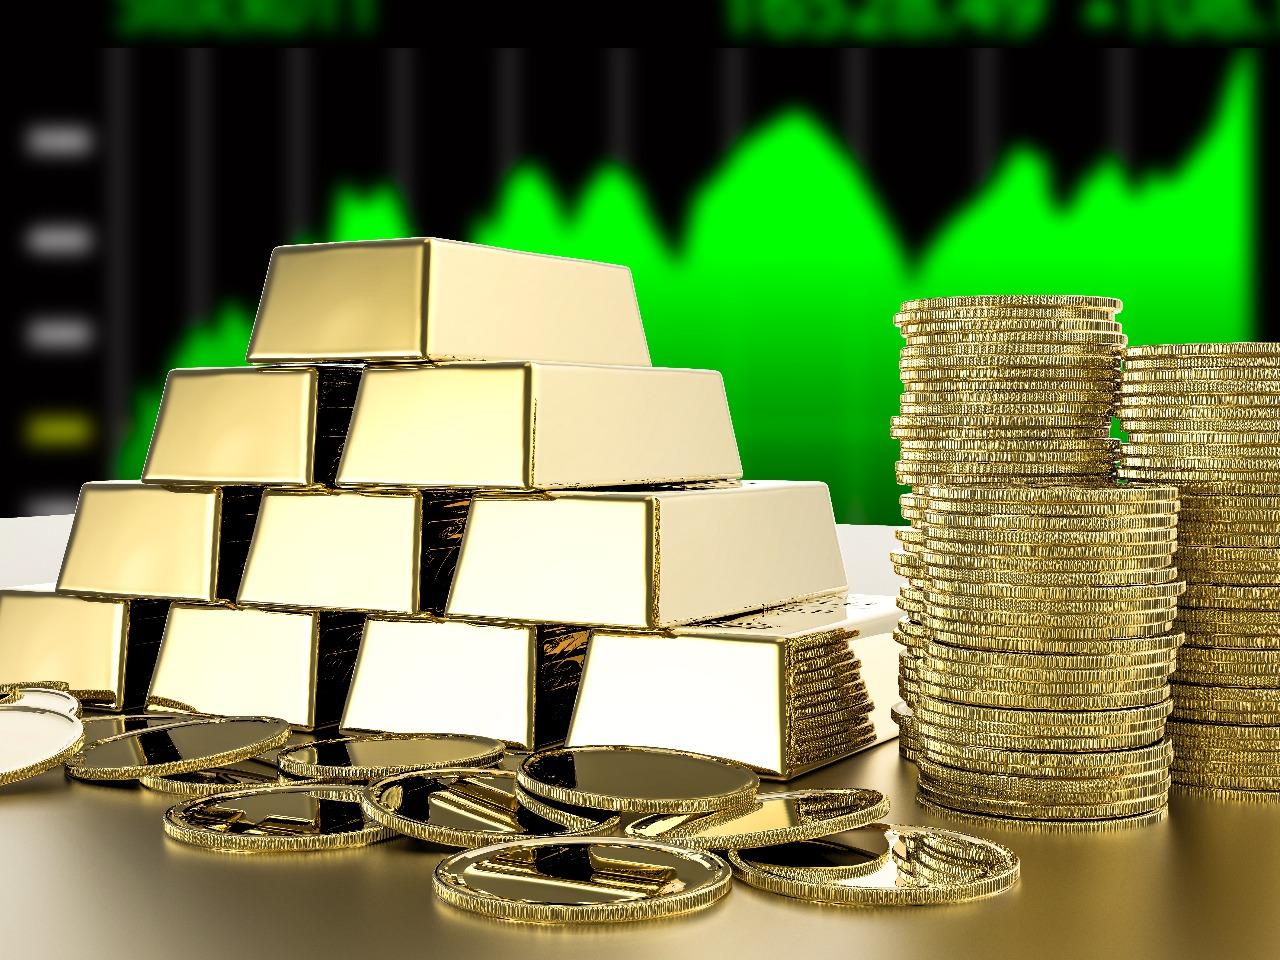 https: img.okezone.com content 2020 08 12 320 2261184 harga-emas-meroket-hartadinata-gencar-produksi-logam-mulia-a85KXnDf47.jpg